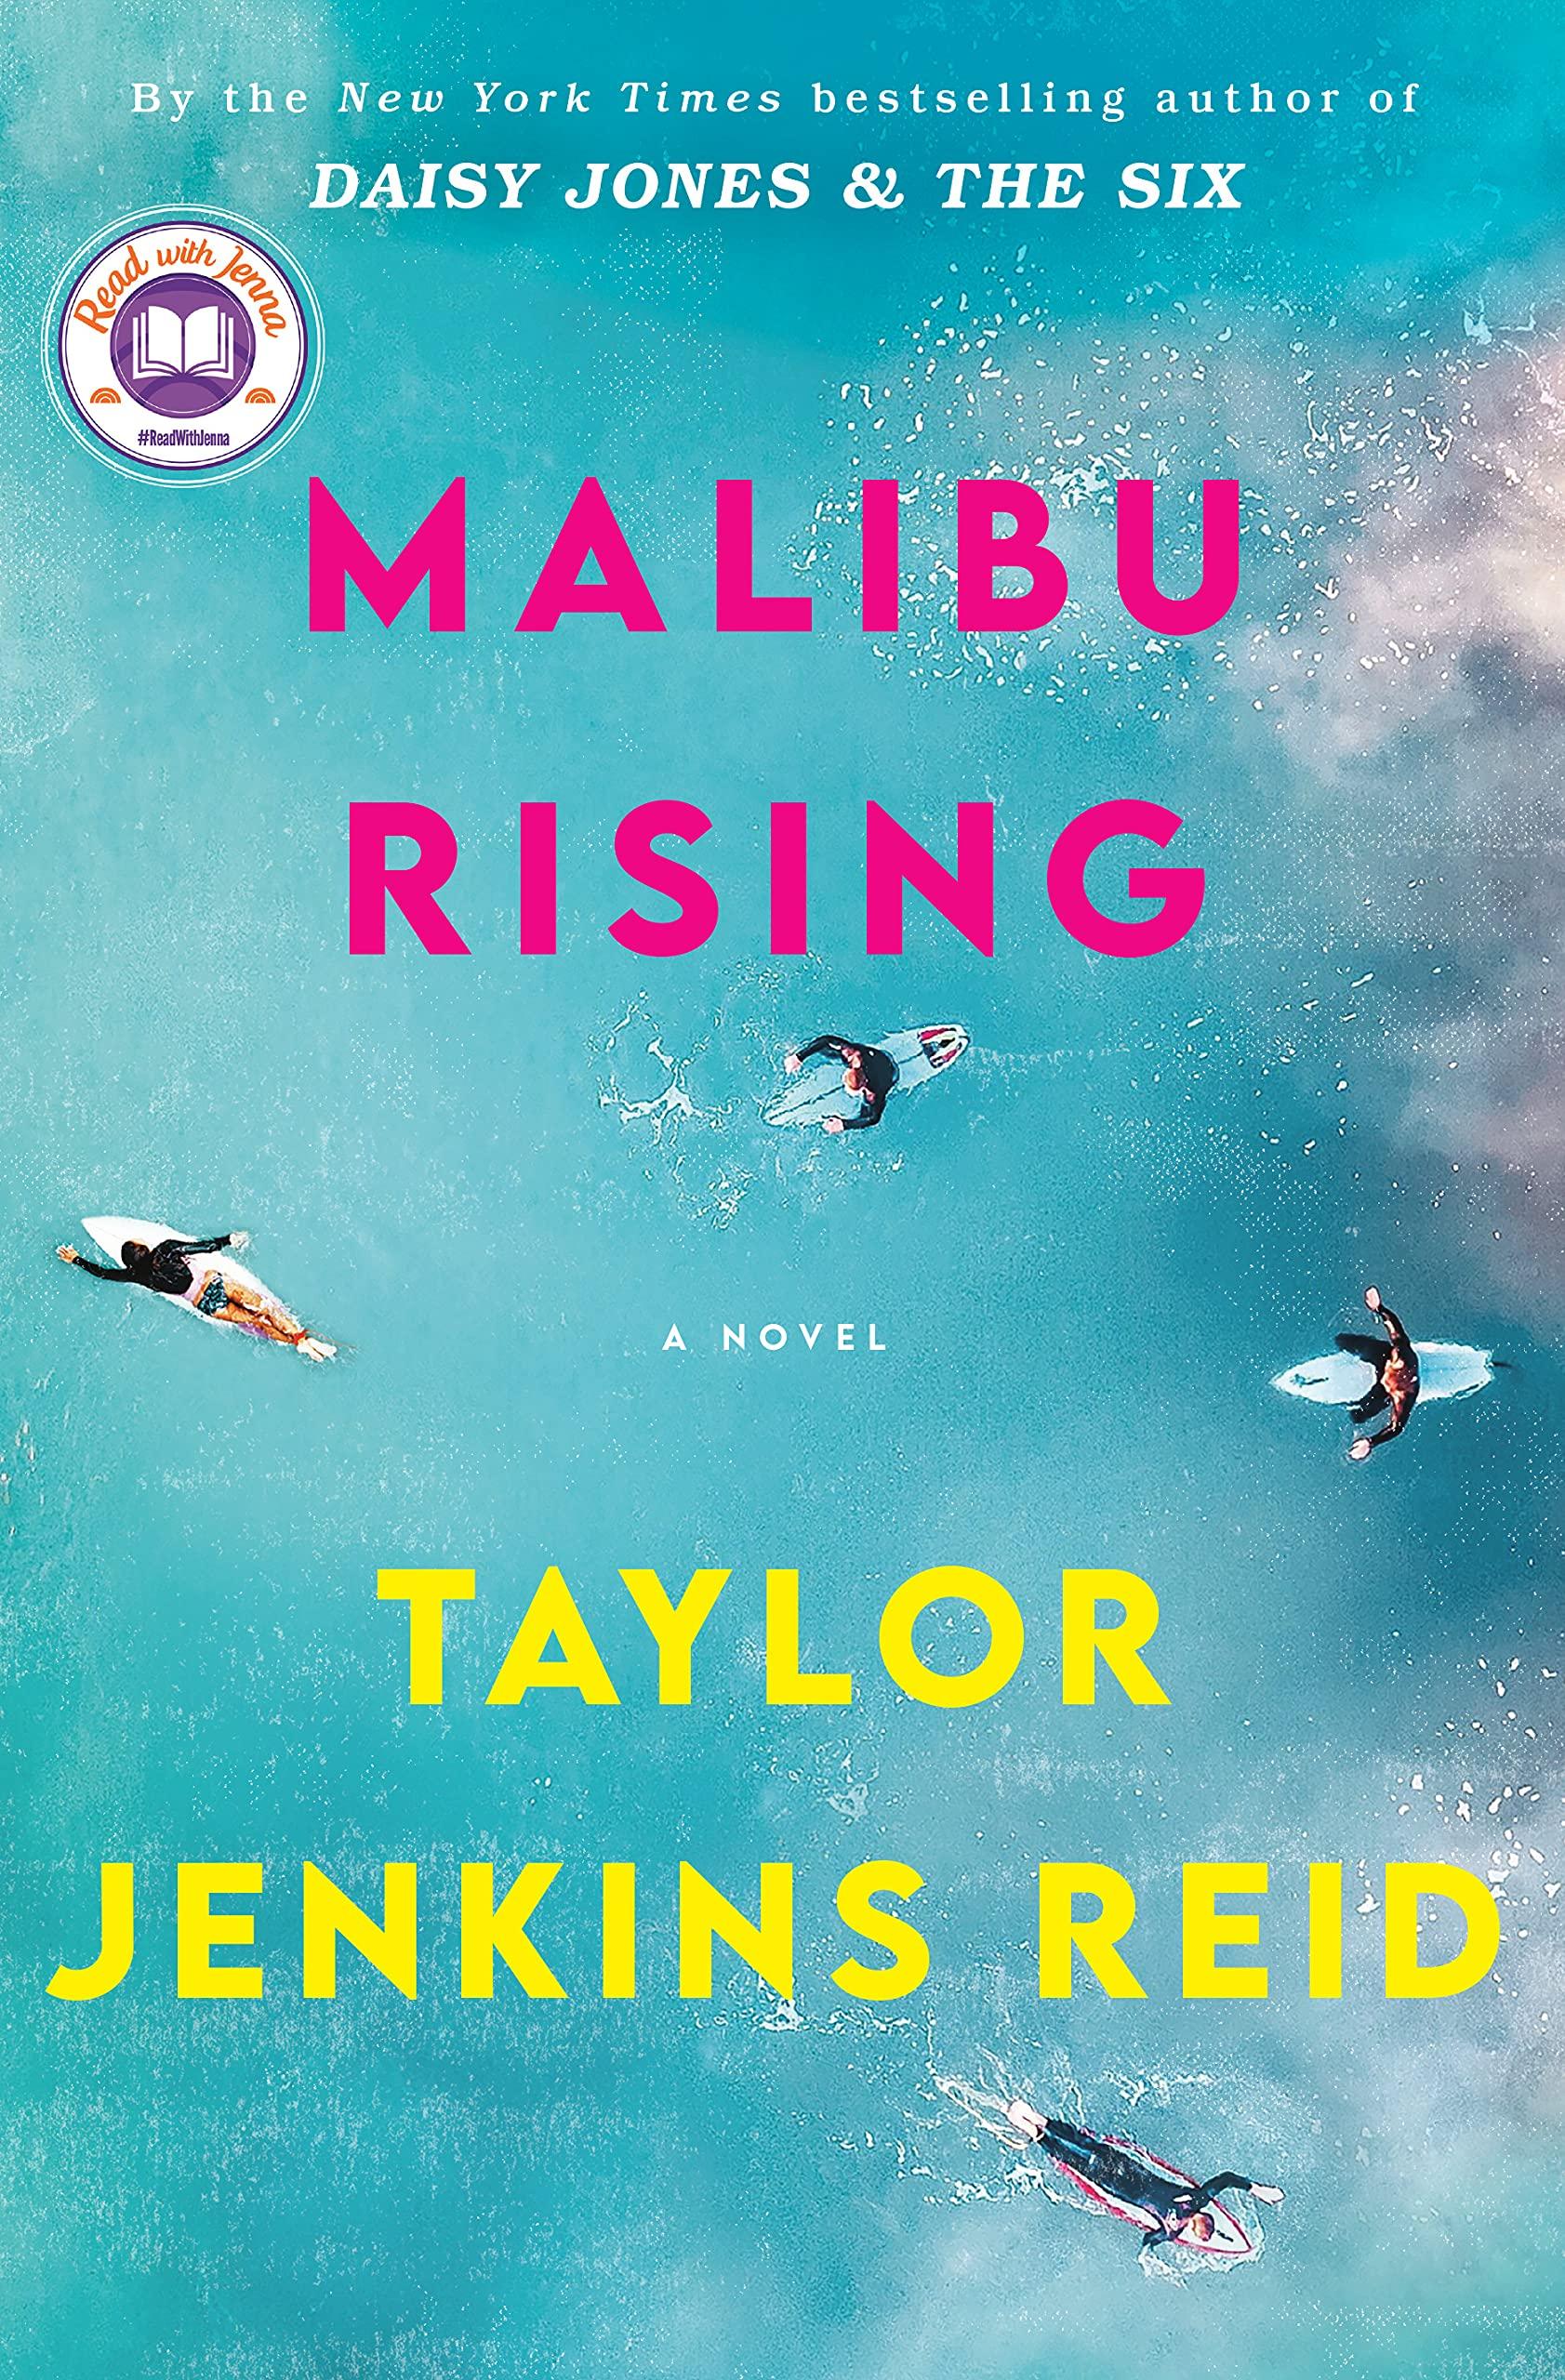 Malibu Rising: A Novel: Reid, Taylor Jenkins: 9781524798659: Amazon.com: Books